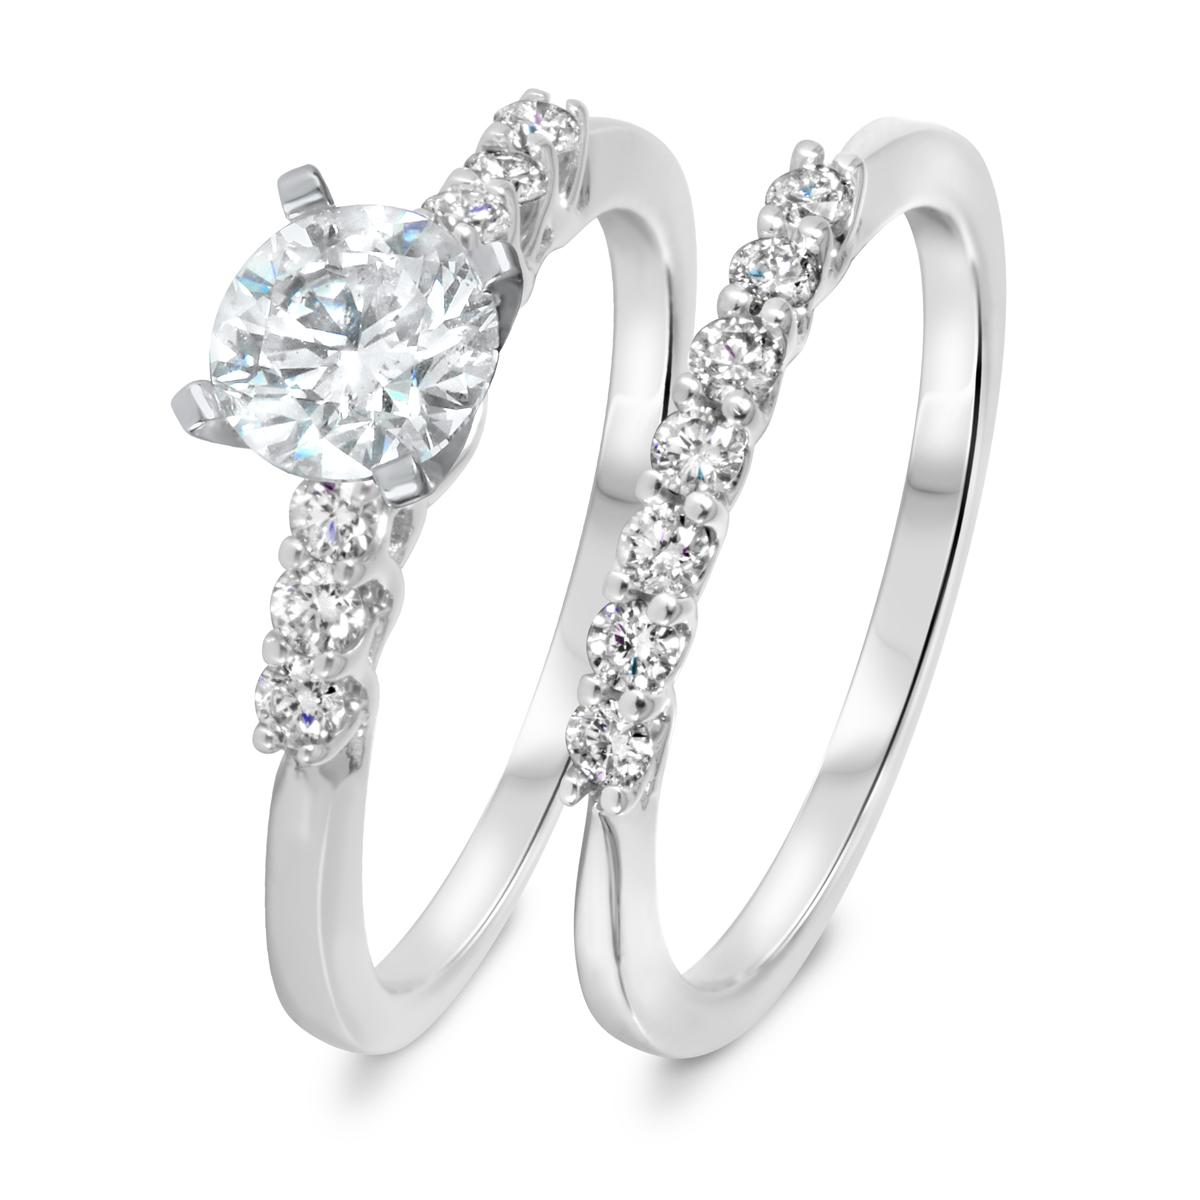 1 3/8 CT. T.W. Diamond Women's Bridal Wedding Ring Set 14K White Gold